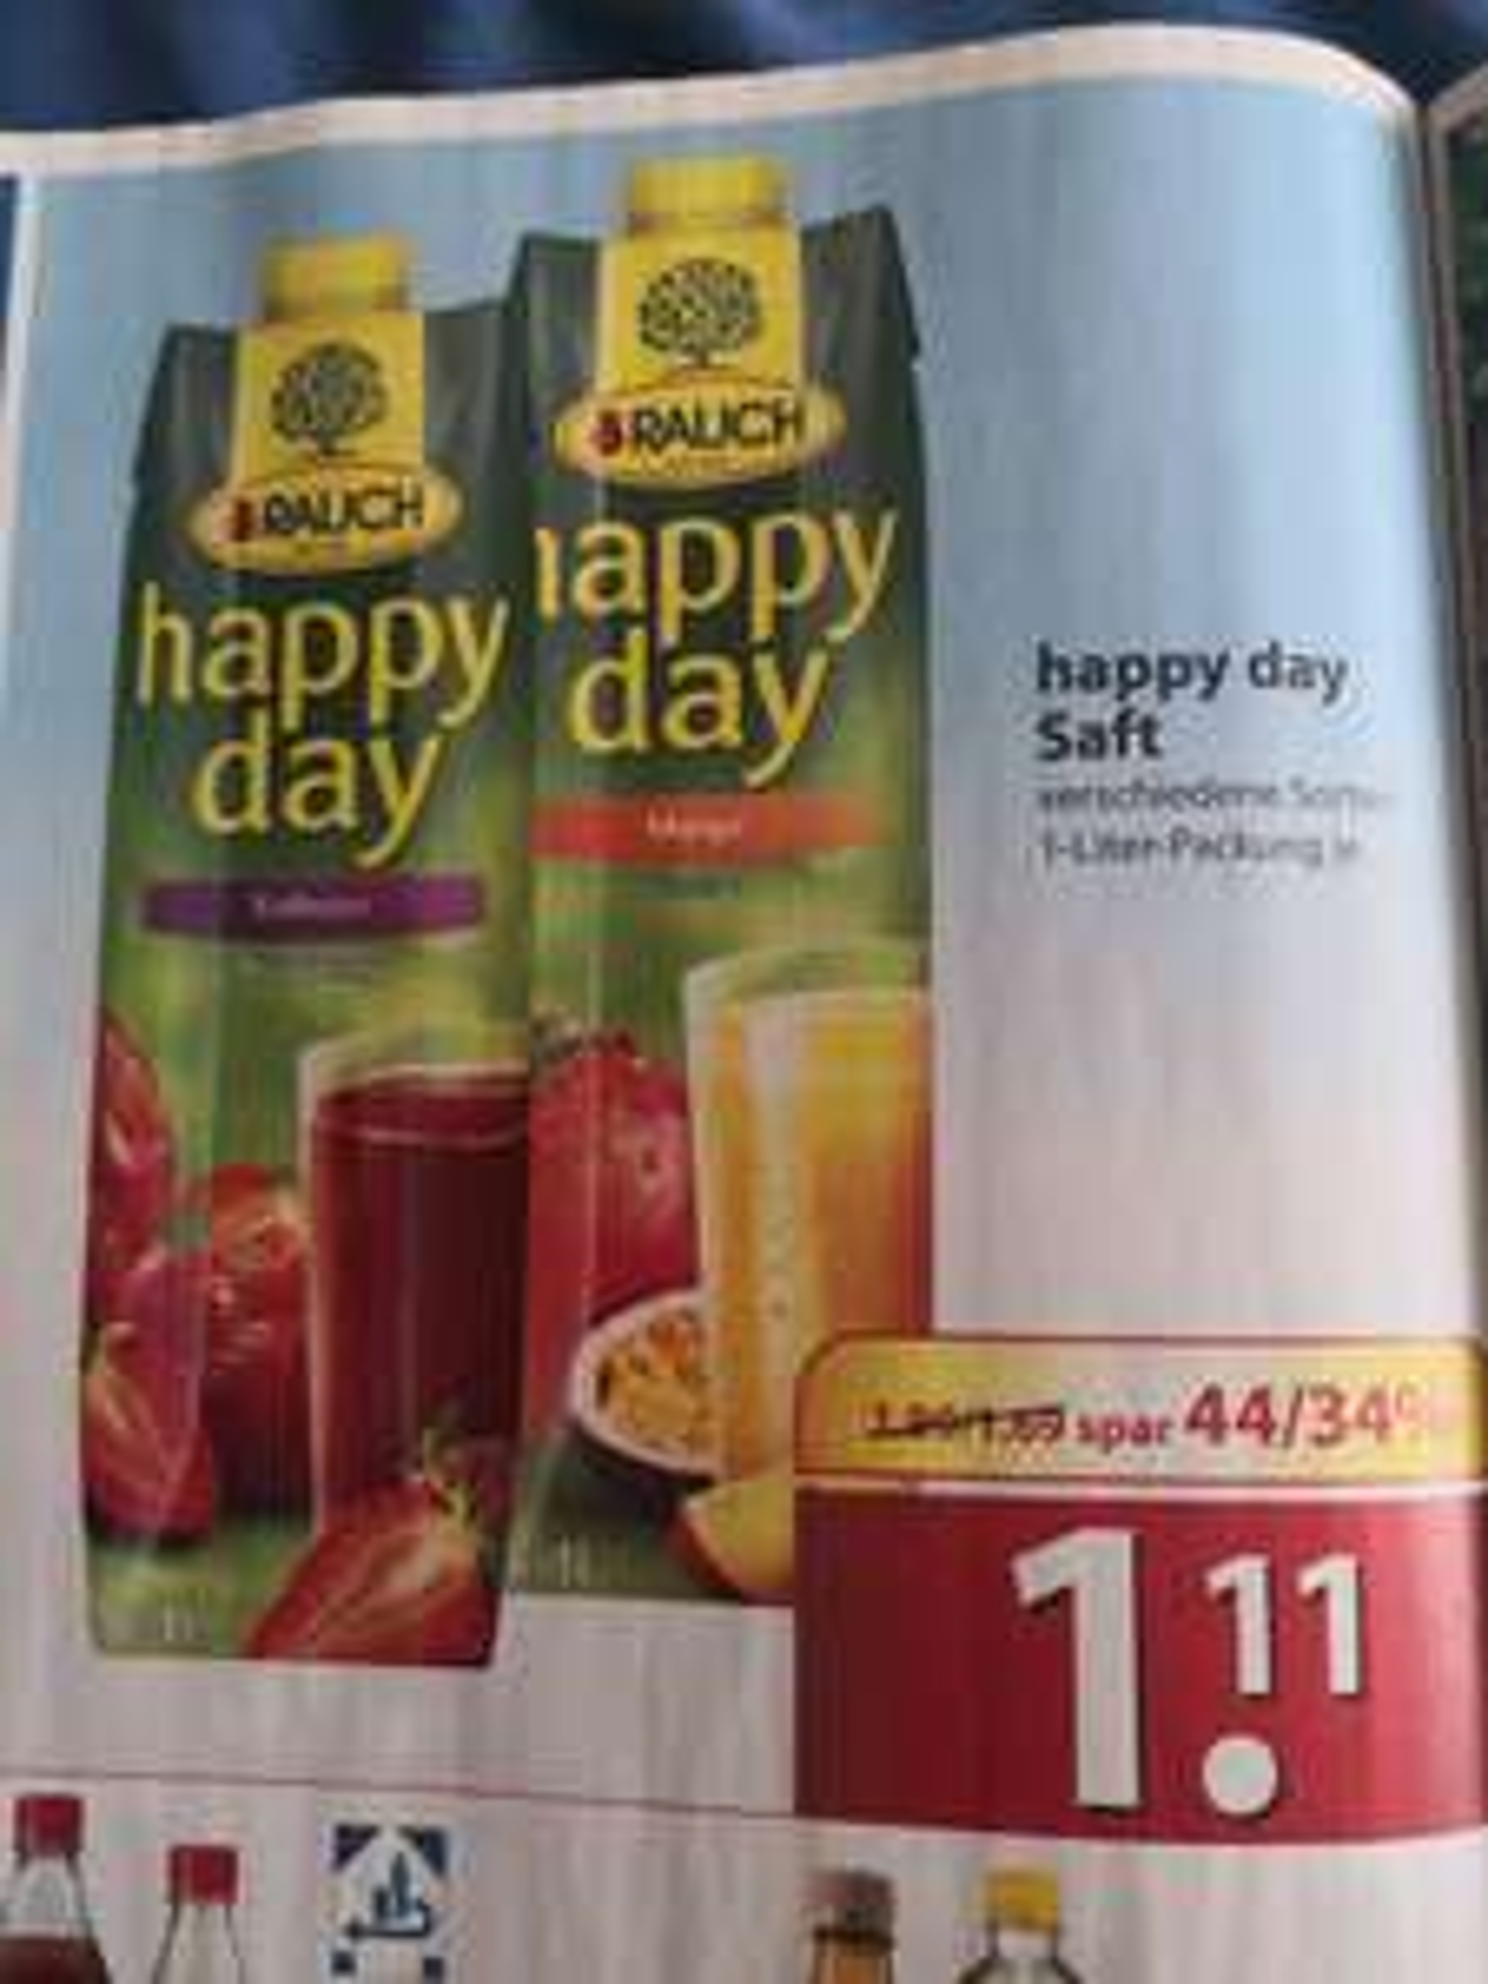 [Famila Nordost] Rauch Happy Day Saft 1L